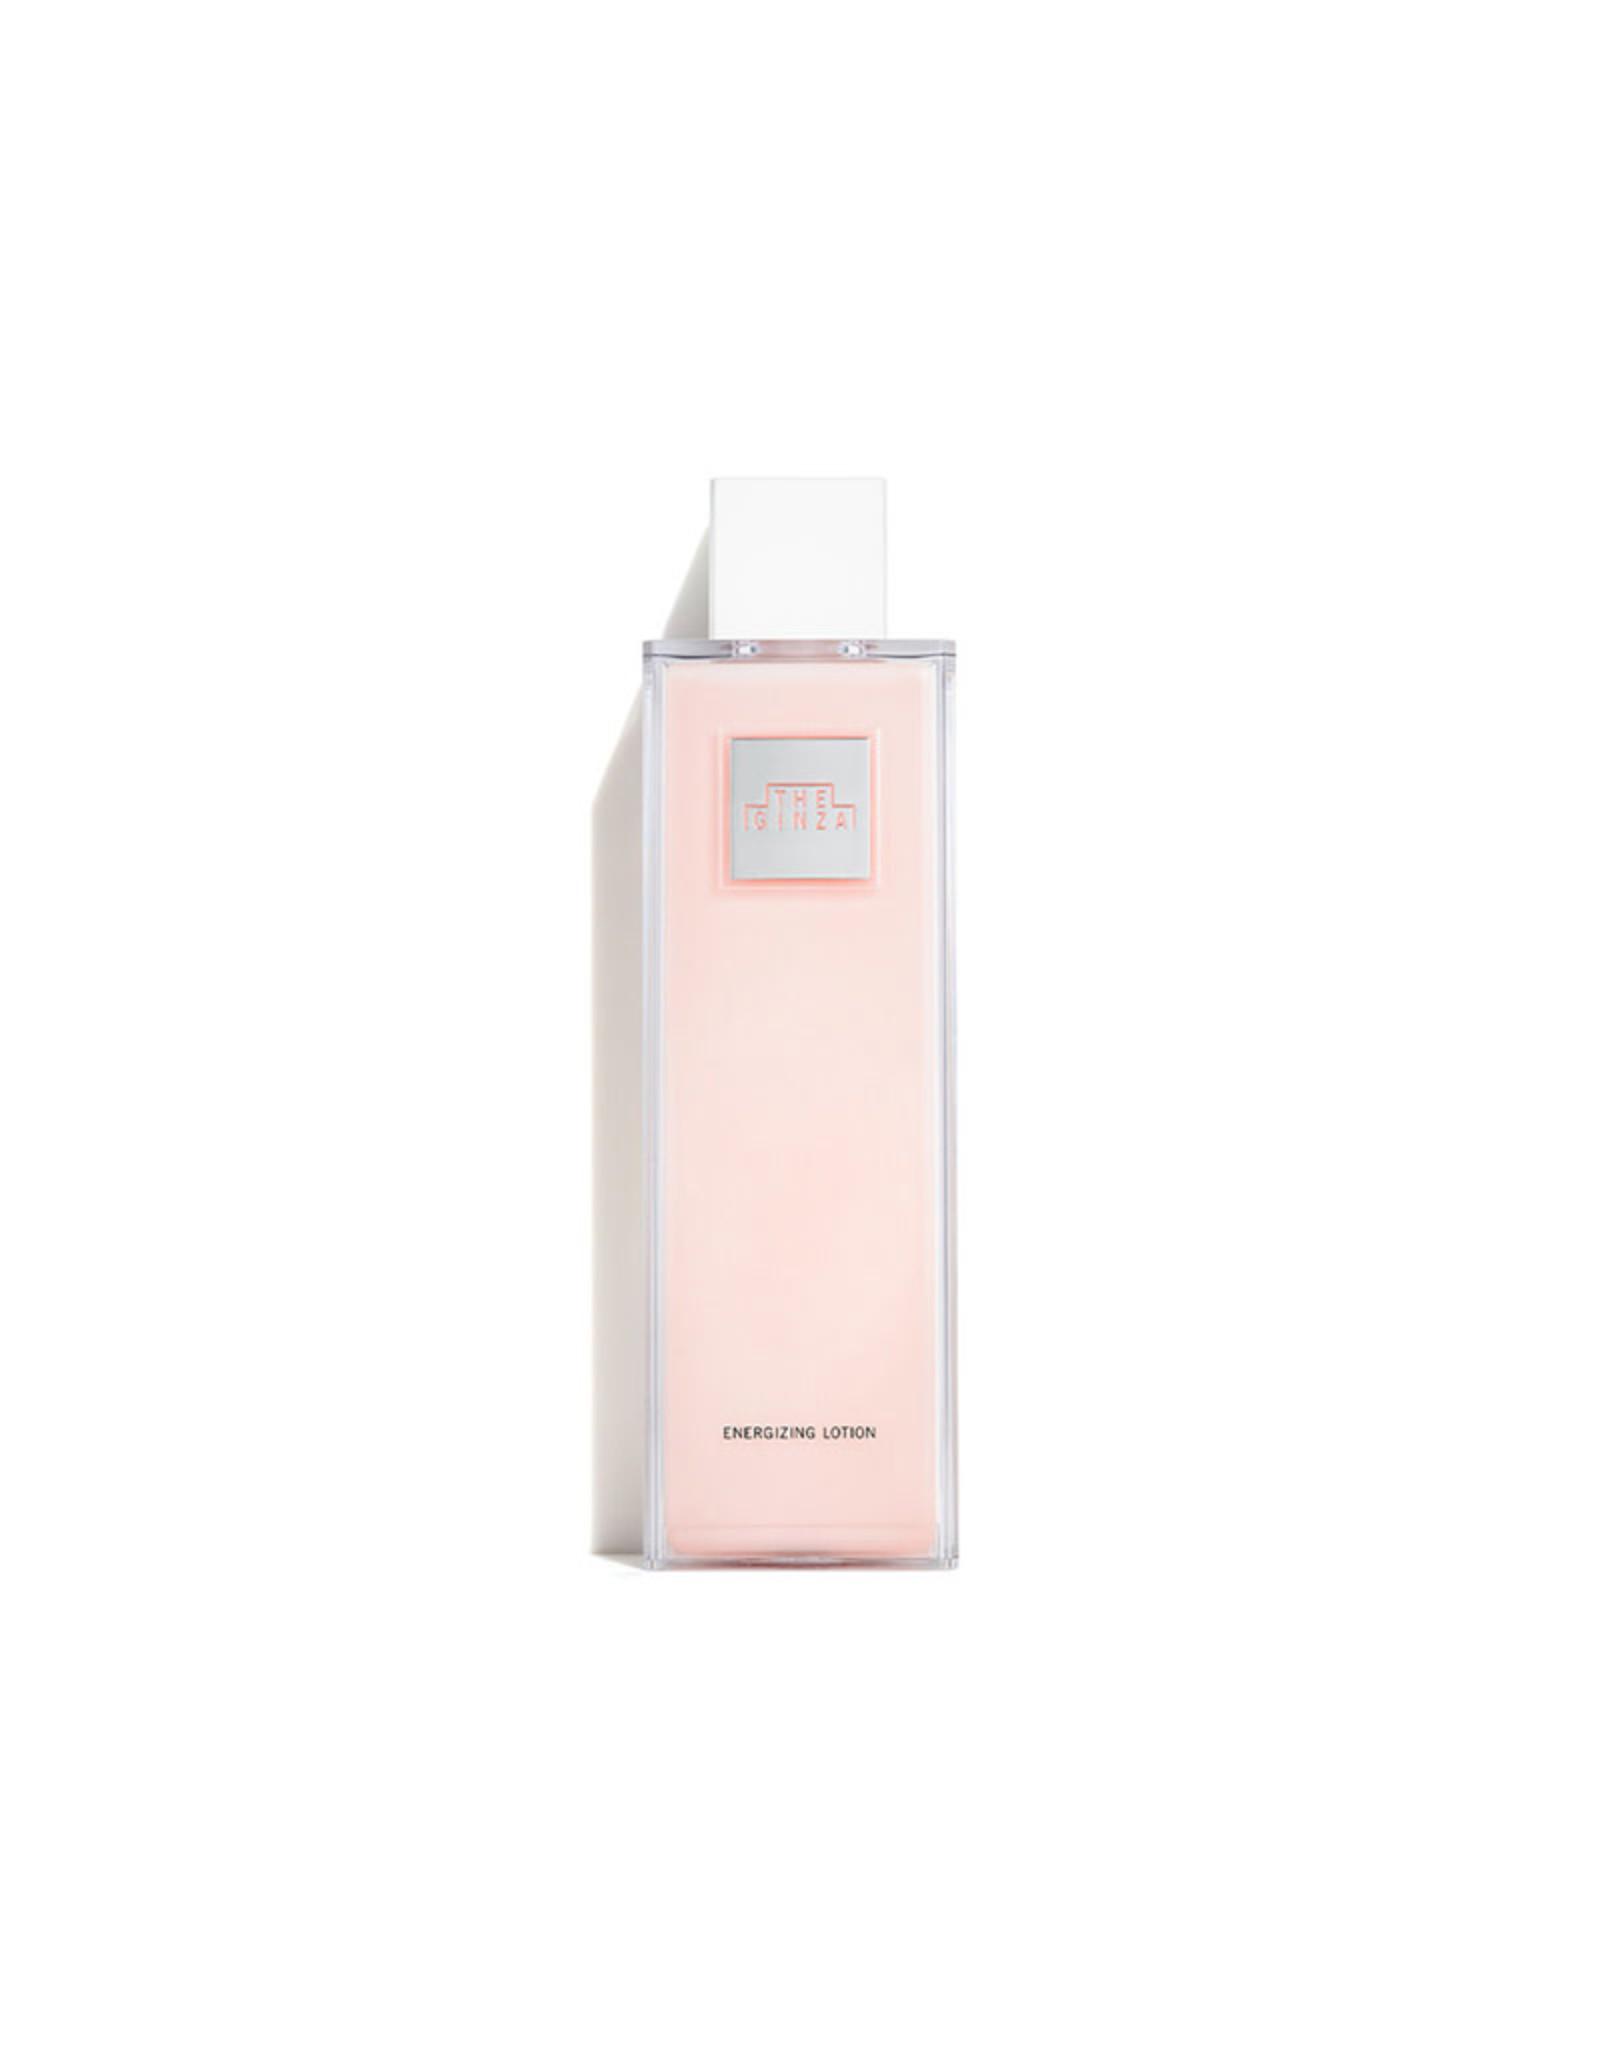 Shiseido The Ginza Energizing Lotion